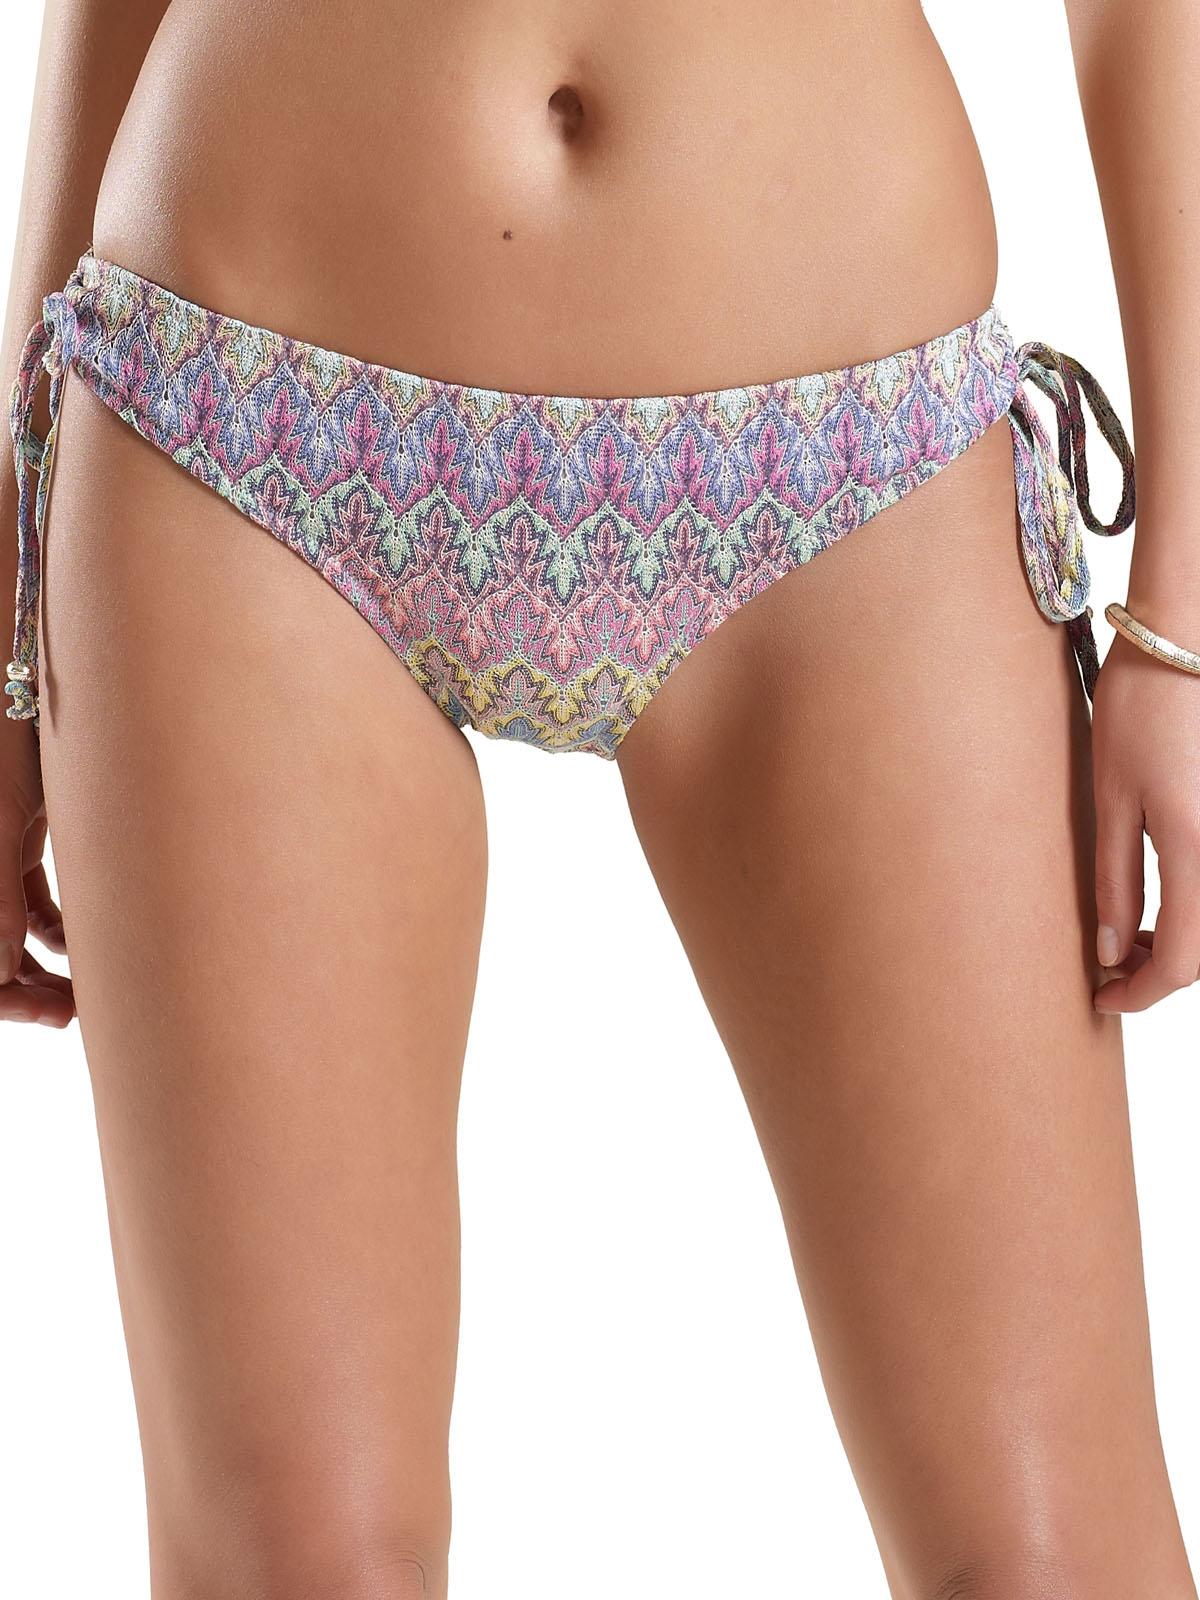 M0ns00n Accessor1ze PURPLE Leaf Crochet Bikini - Size 16 to 18